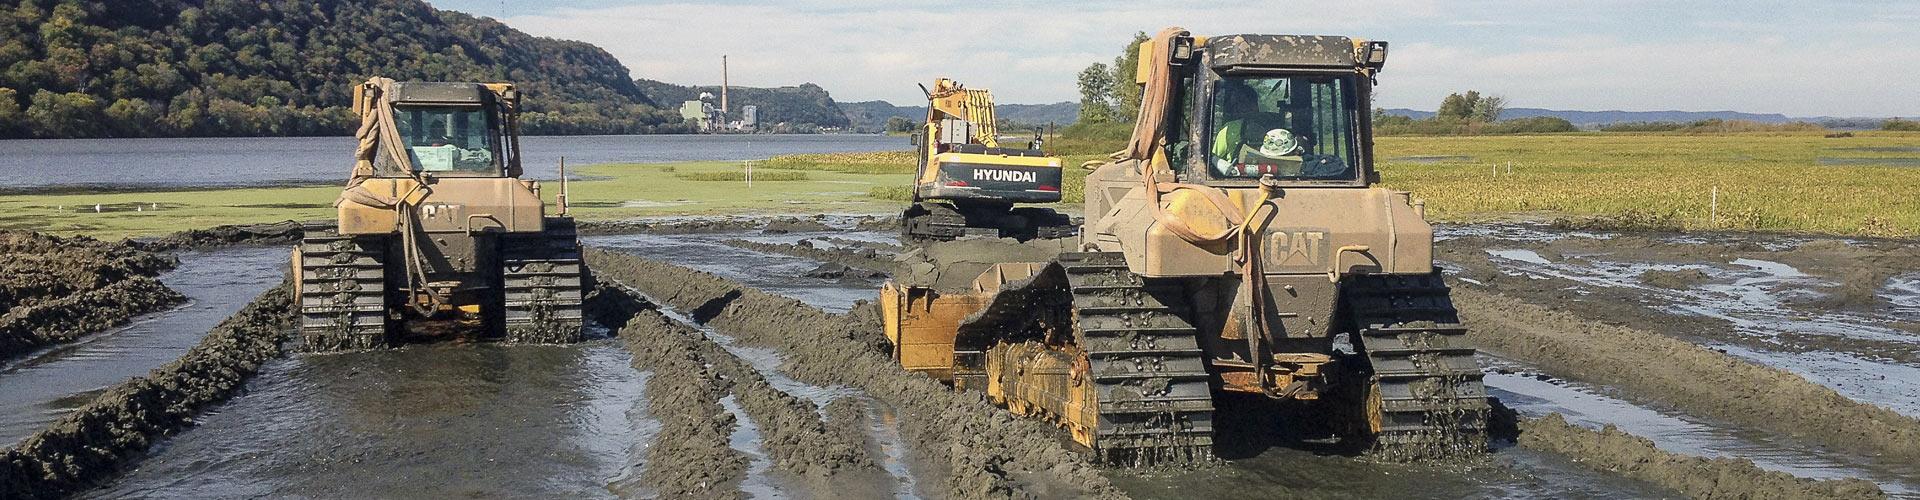 Environmental Dredging, Mechanical Dredging, Environmental Remediation, Environmental Cleanup, Weltand Remediation, Environmental Restoration, Wetland Restoration, Wetland Rehabilitation